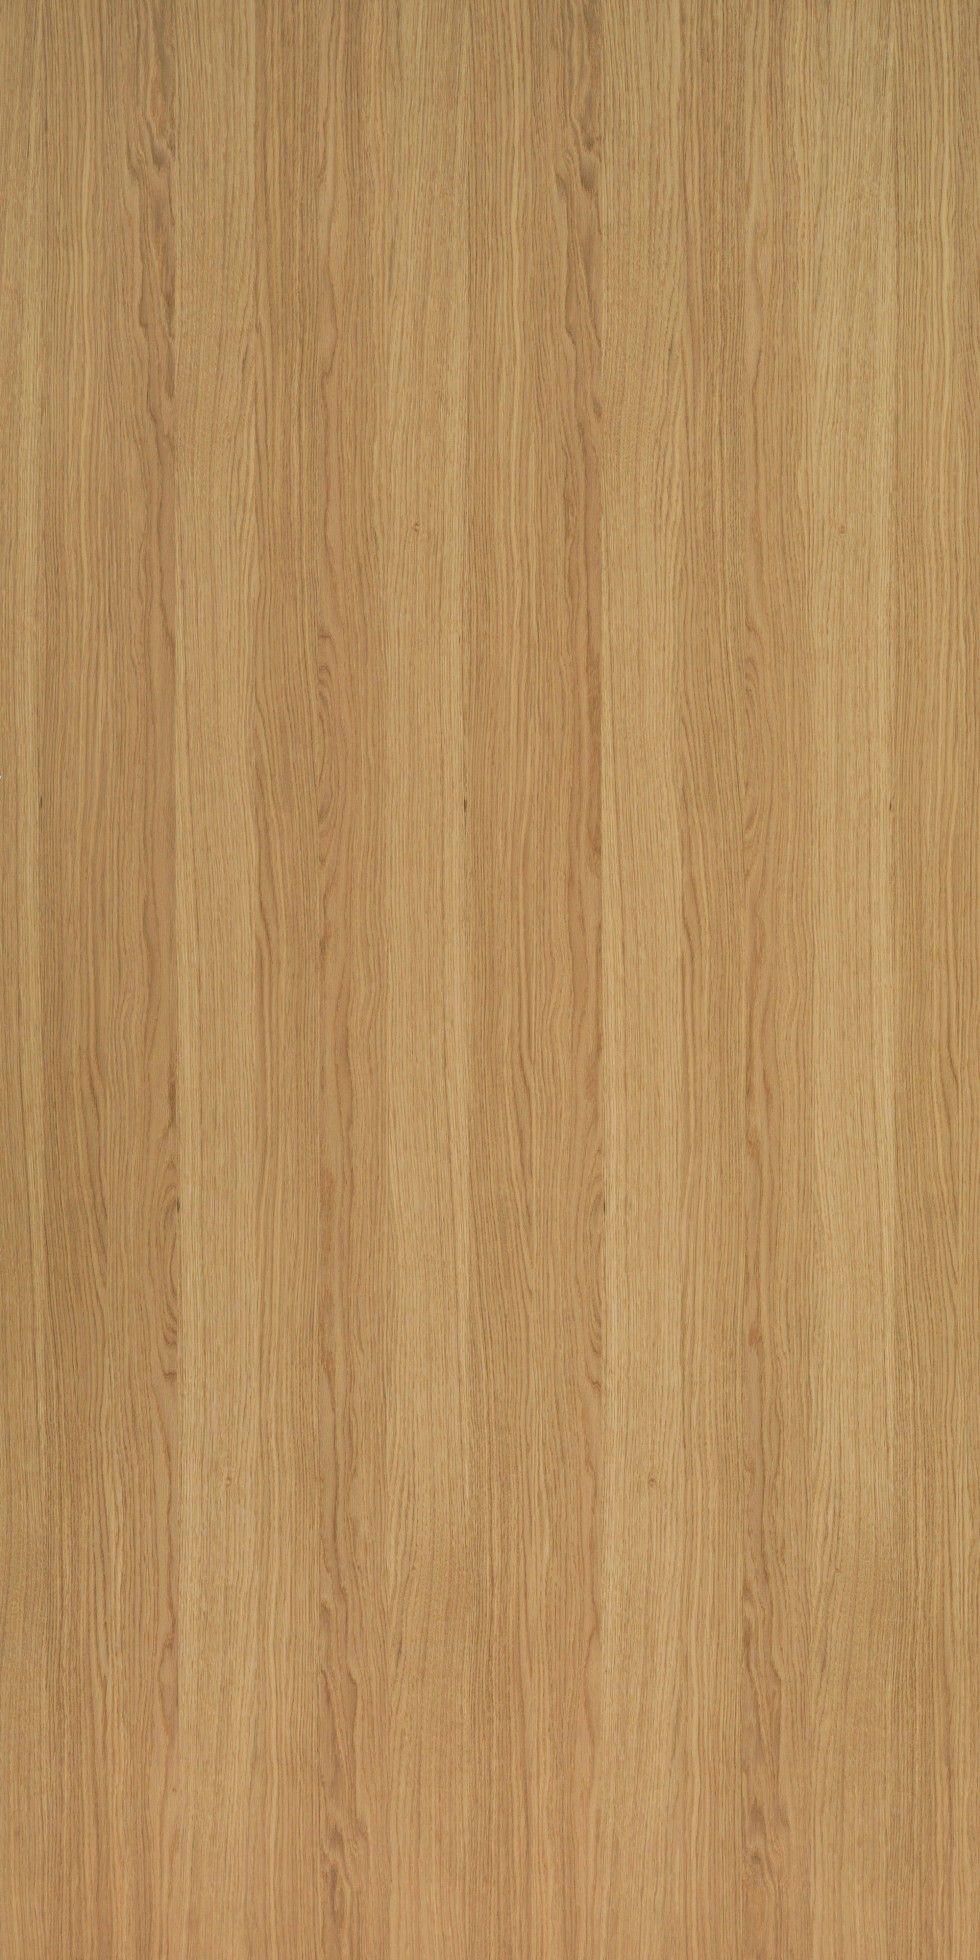 Allegro Texture Wood W 2019 Oak Wood Texture Wood